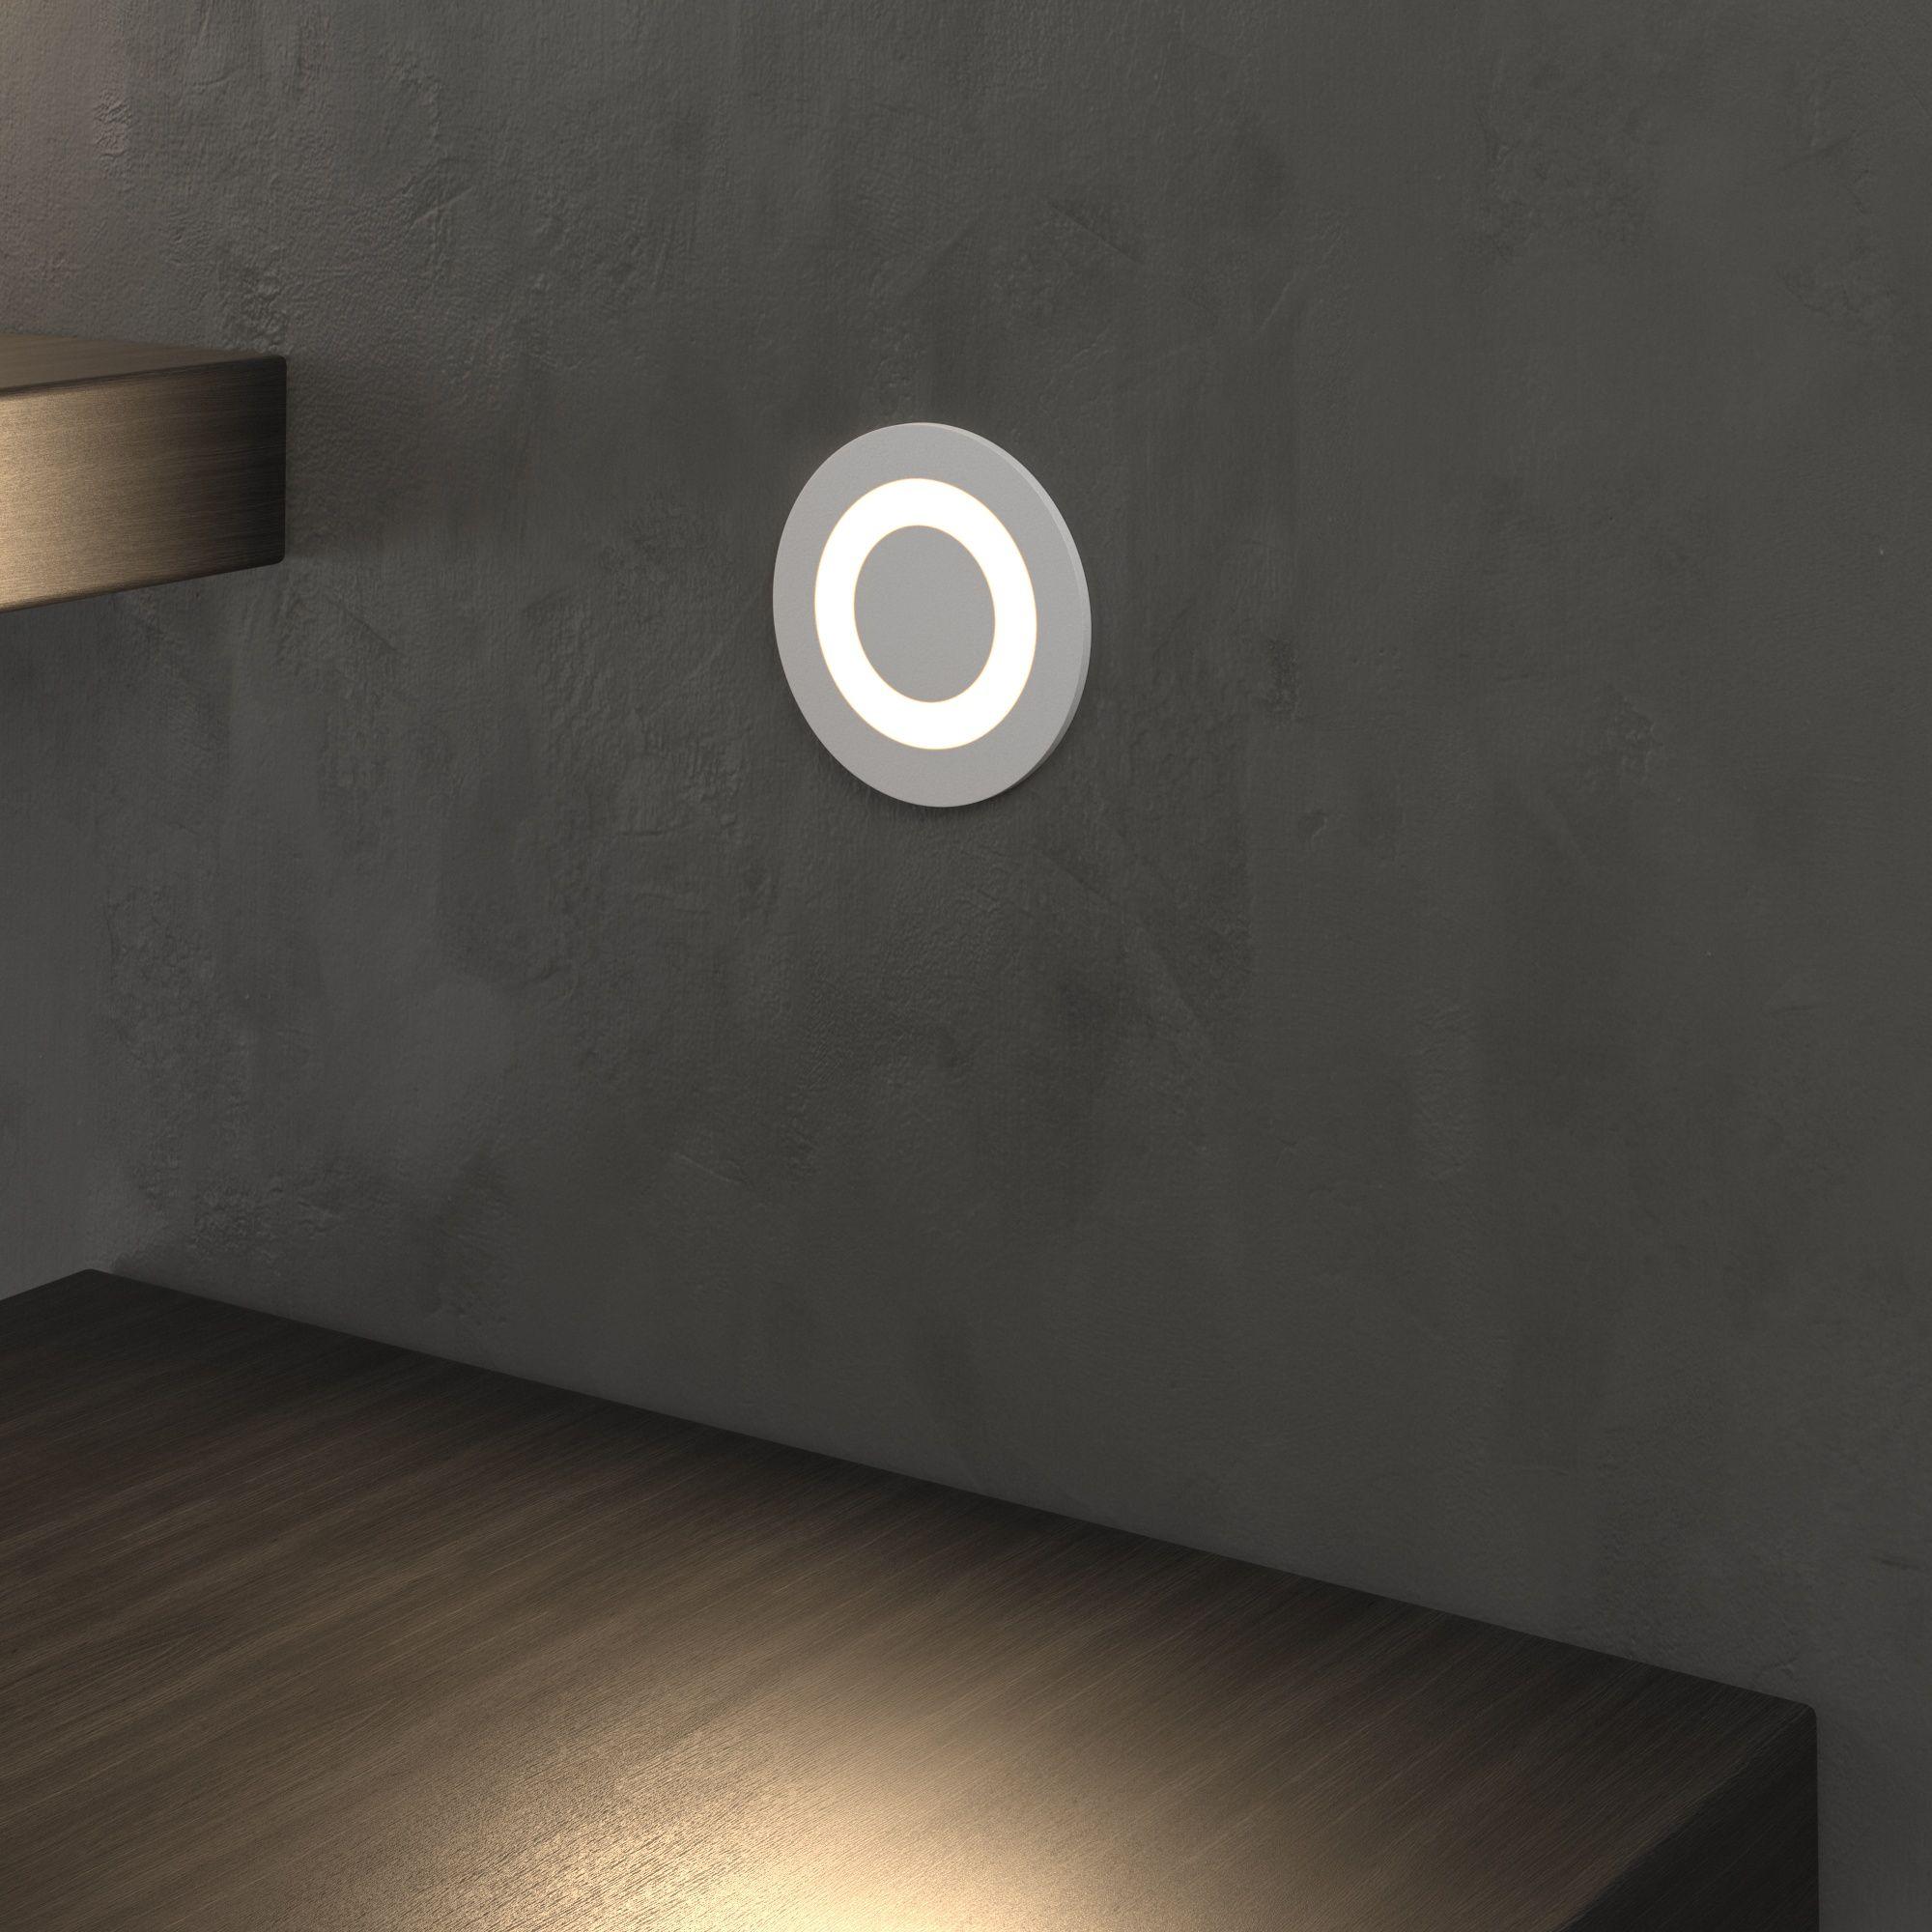 Подсветка для лестниц и дорожек MRL LED 1107 белый